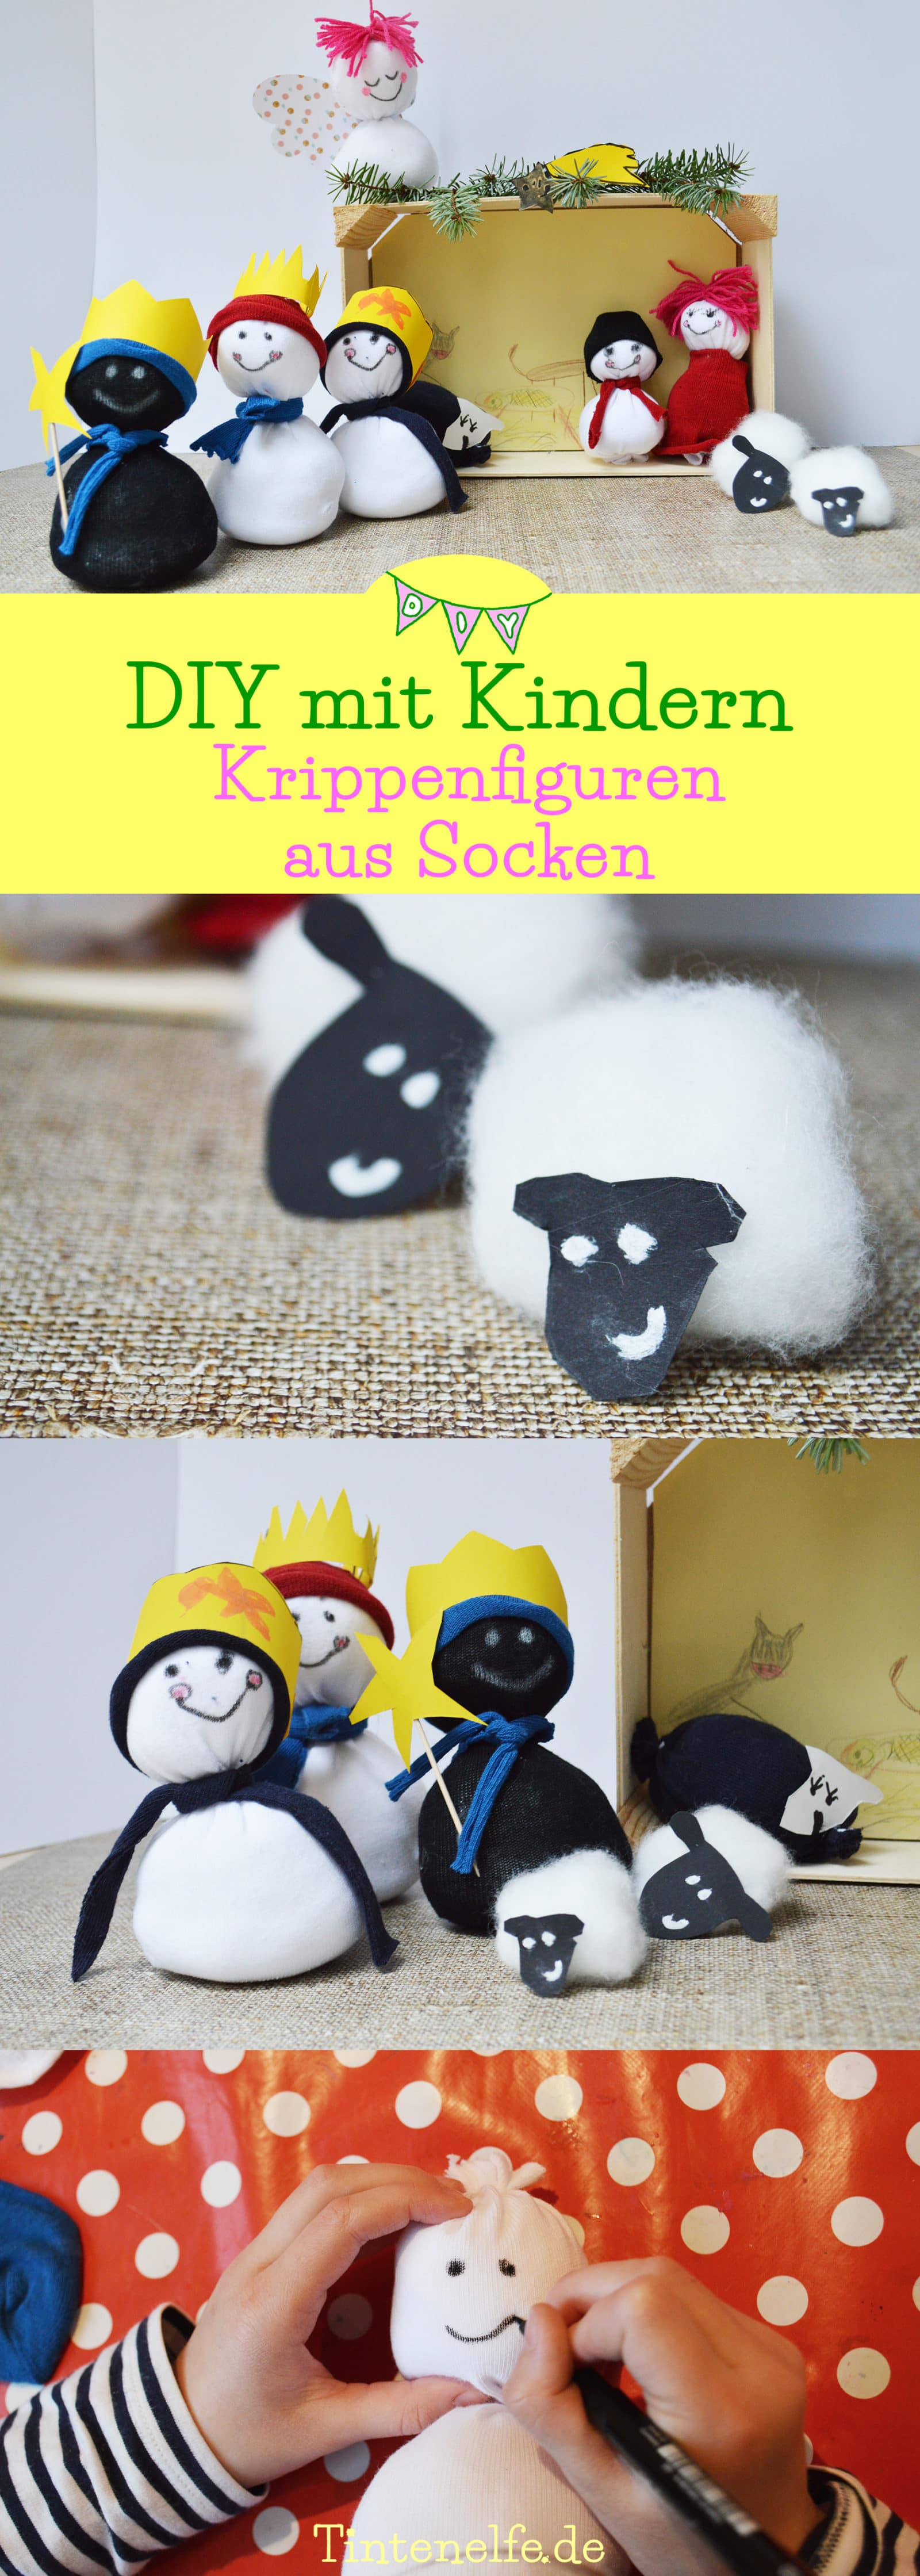 diy mit kindern krippenfiguren aus socken handmade kultur. Black Bedroom Furniture Sets. Home Design Ideas